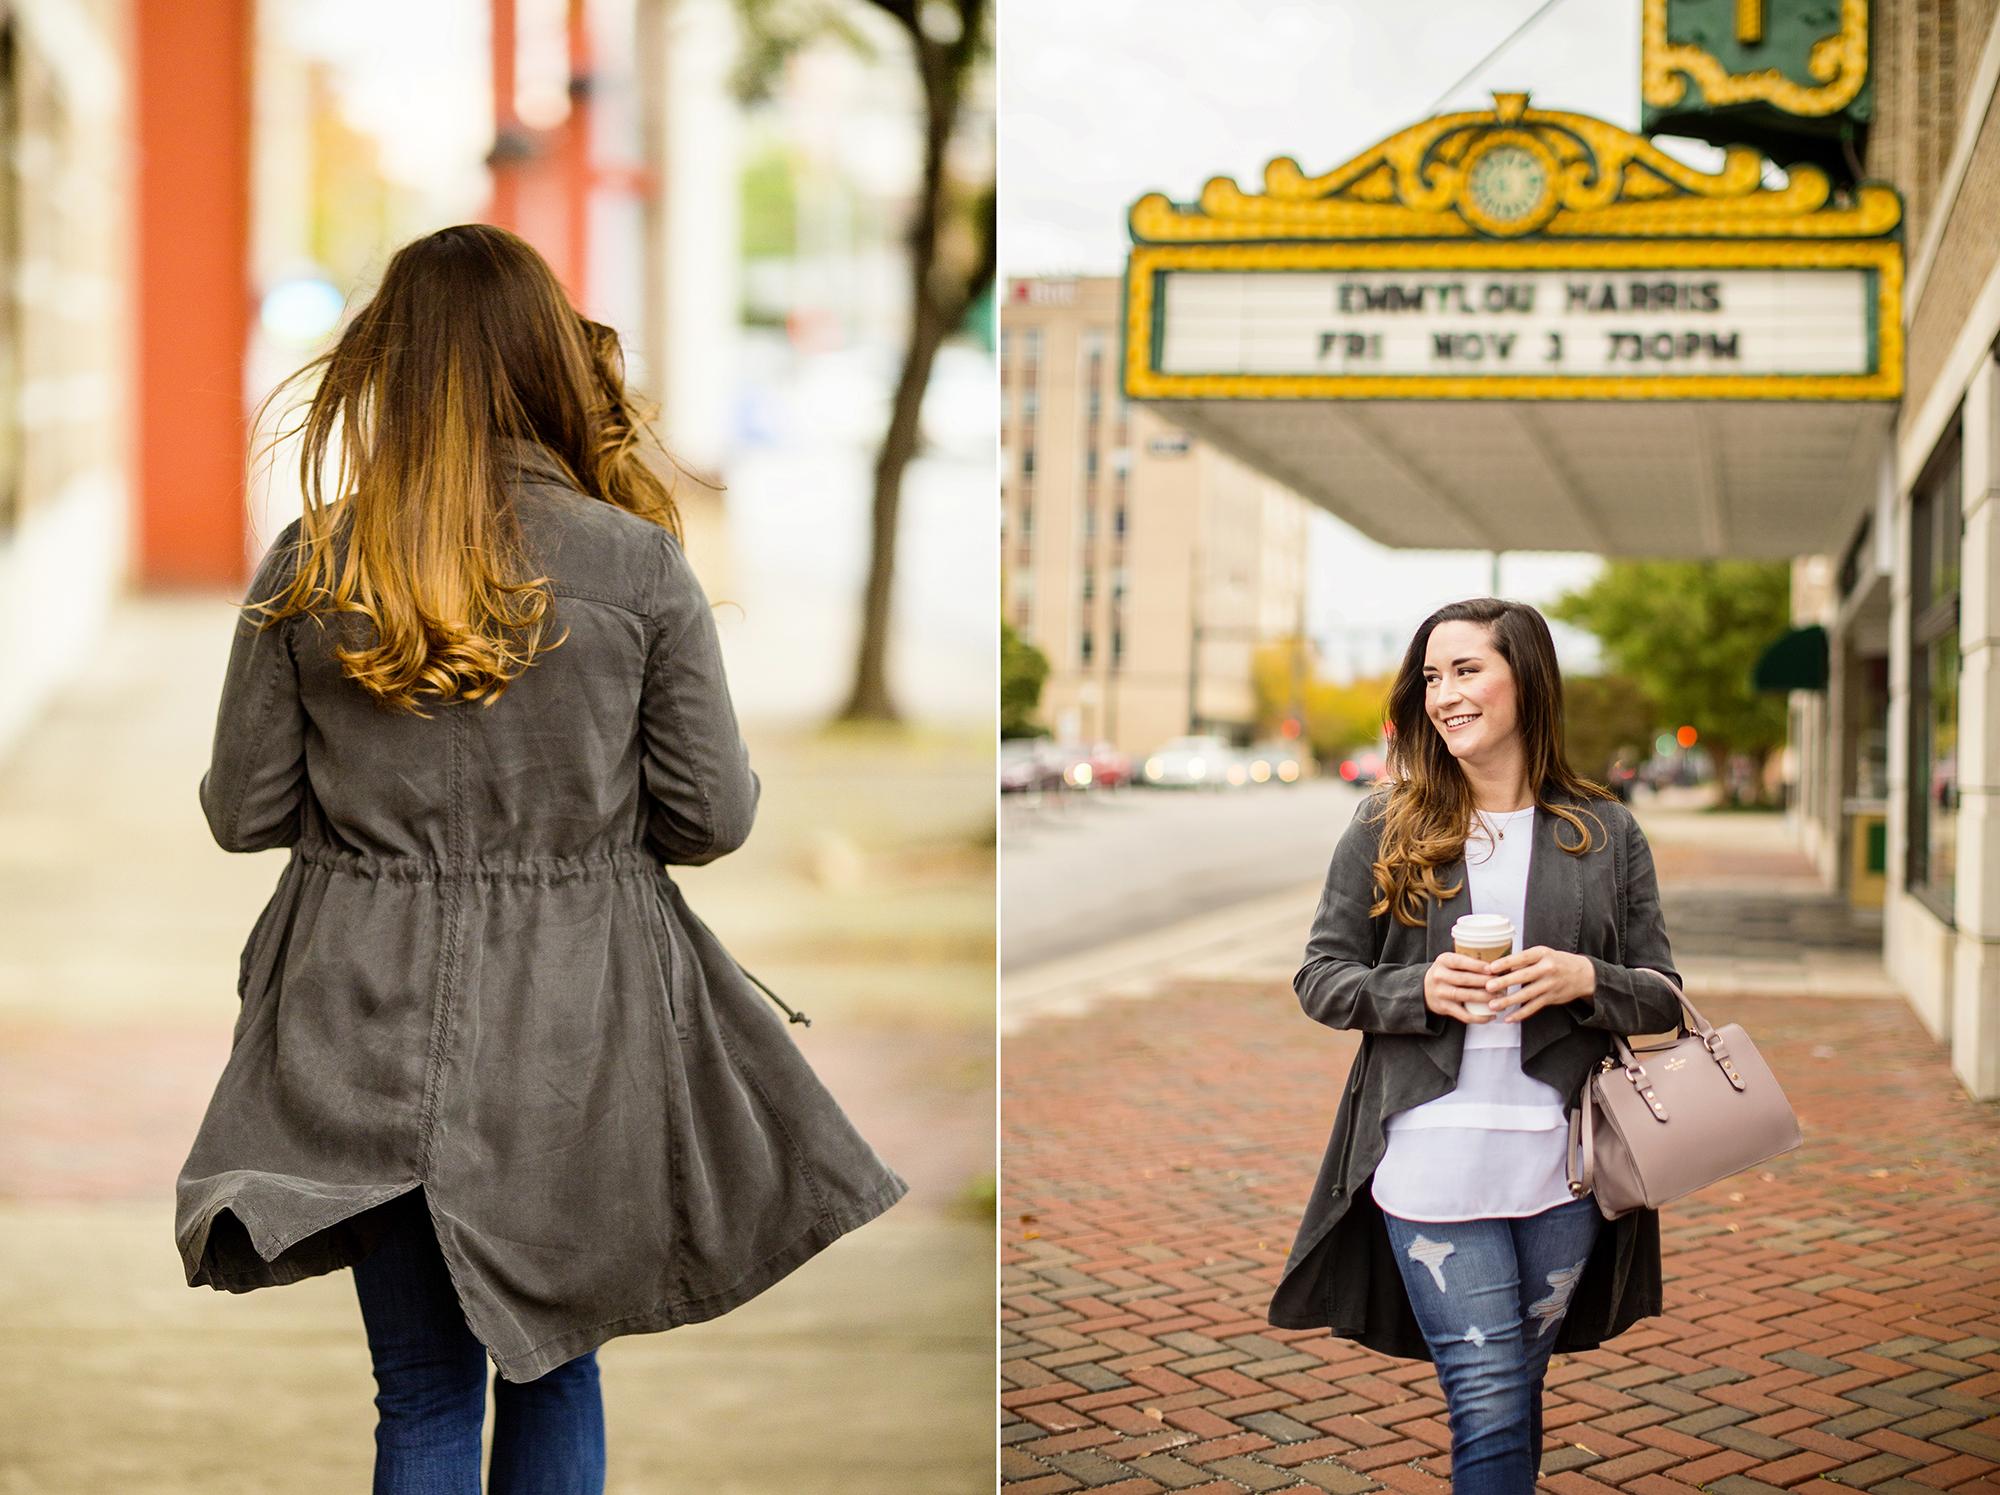 Seriously_Sabrina_Photography_Ashland_Kentucky_Fashion_Blogger_Portraits_LaurenFannin9.jpg